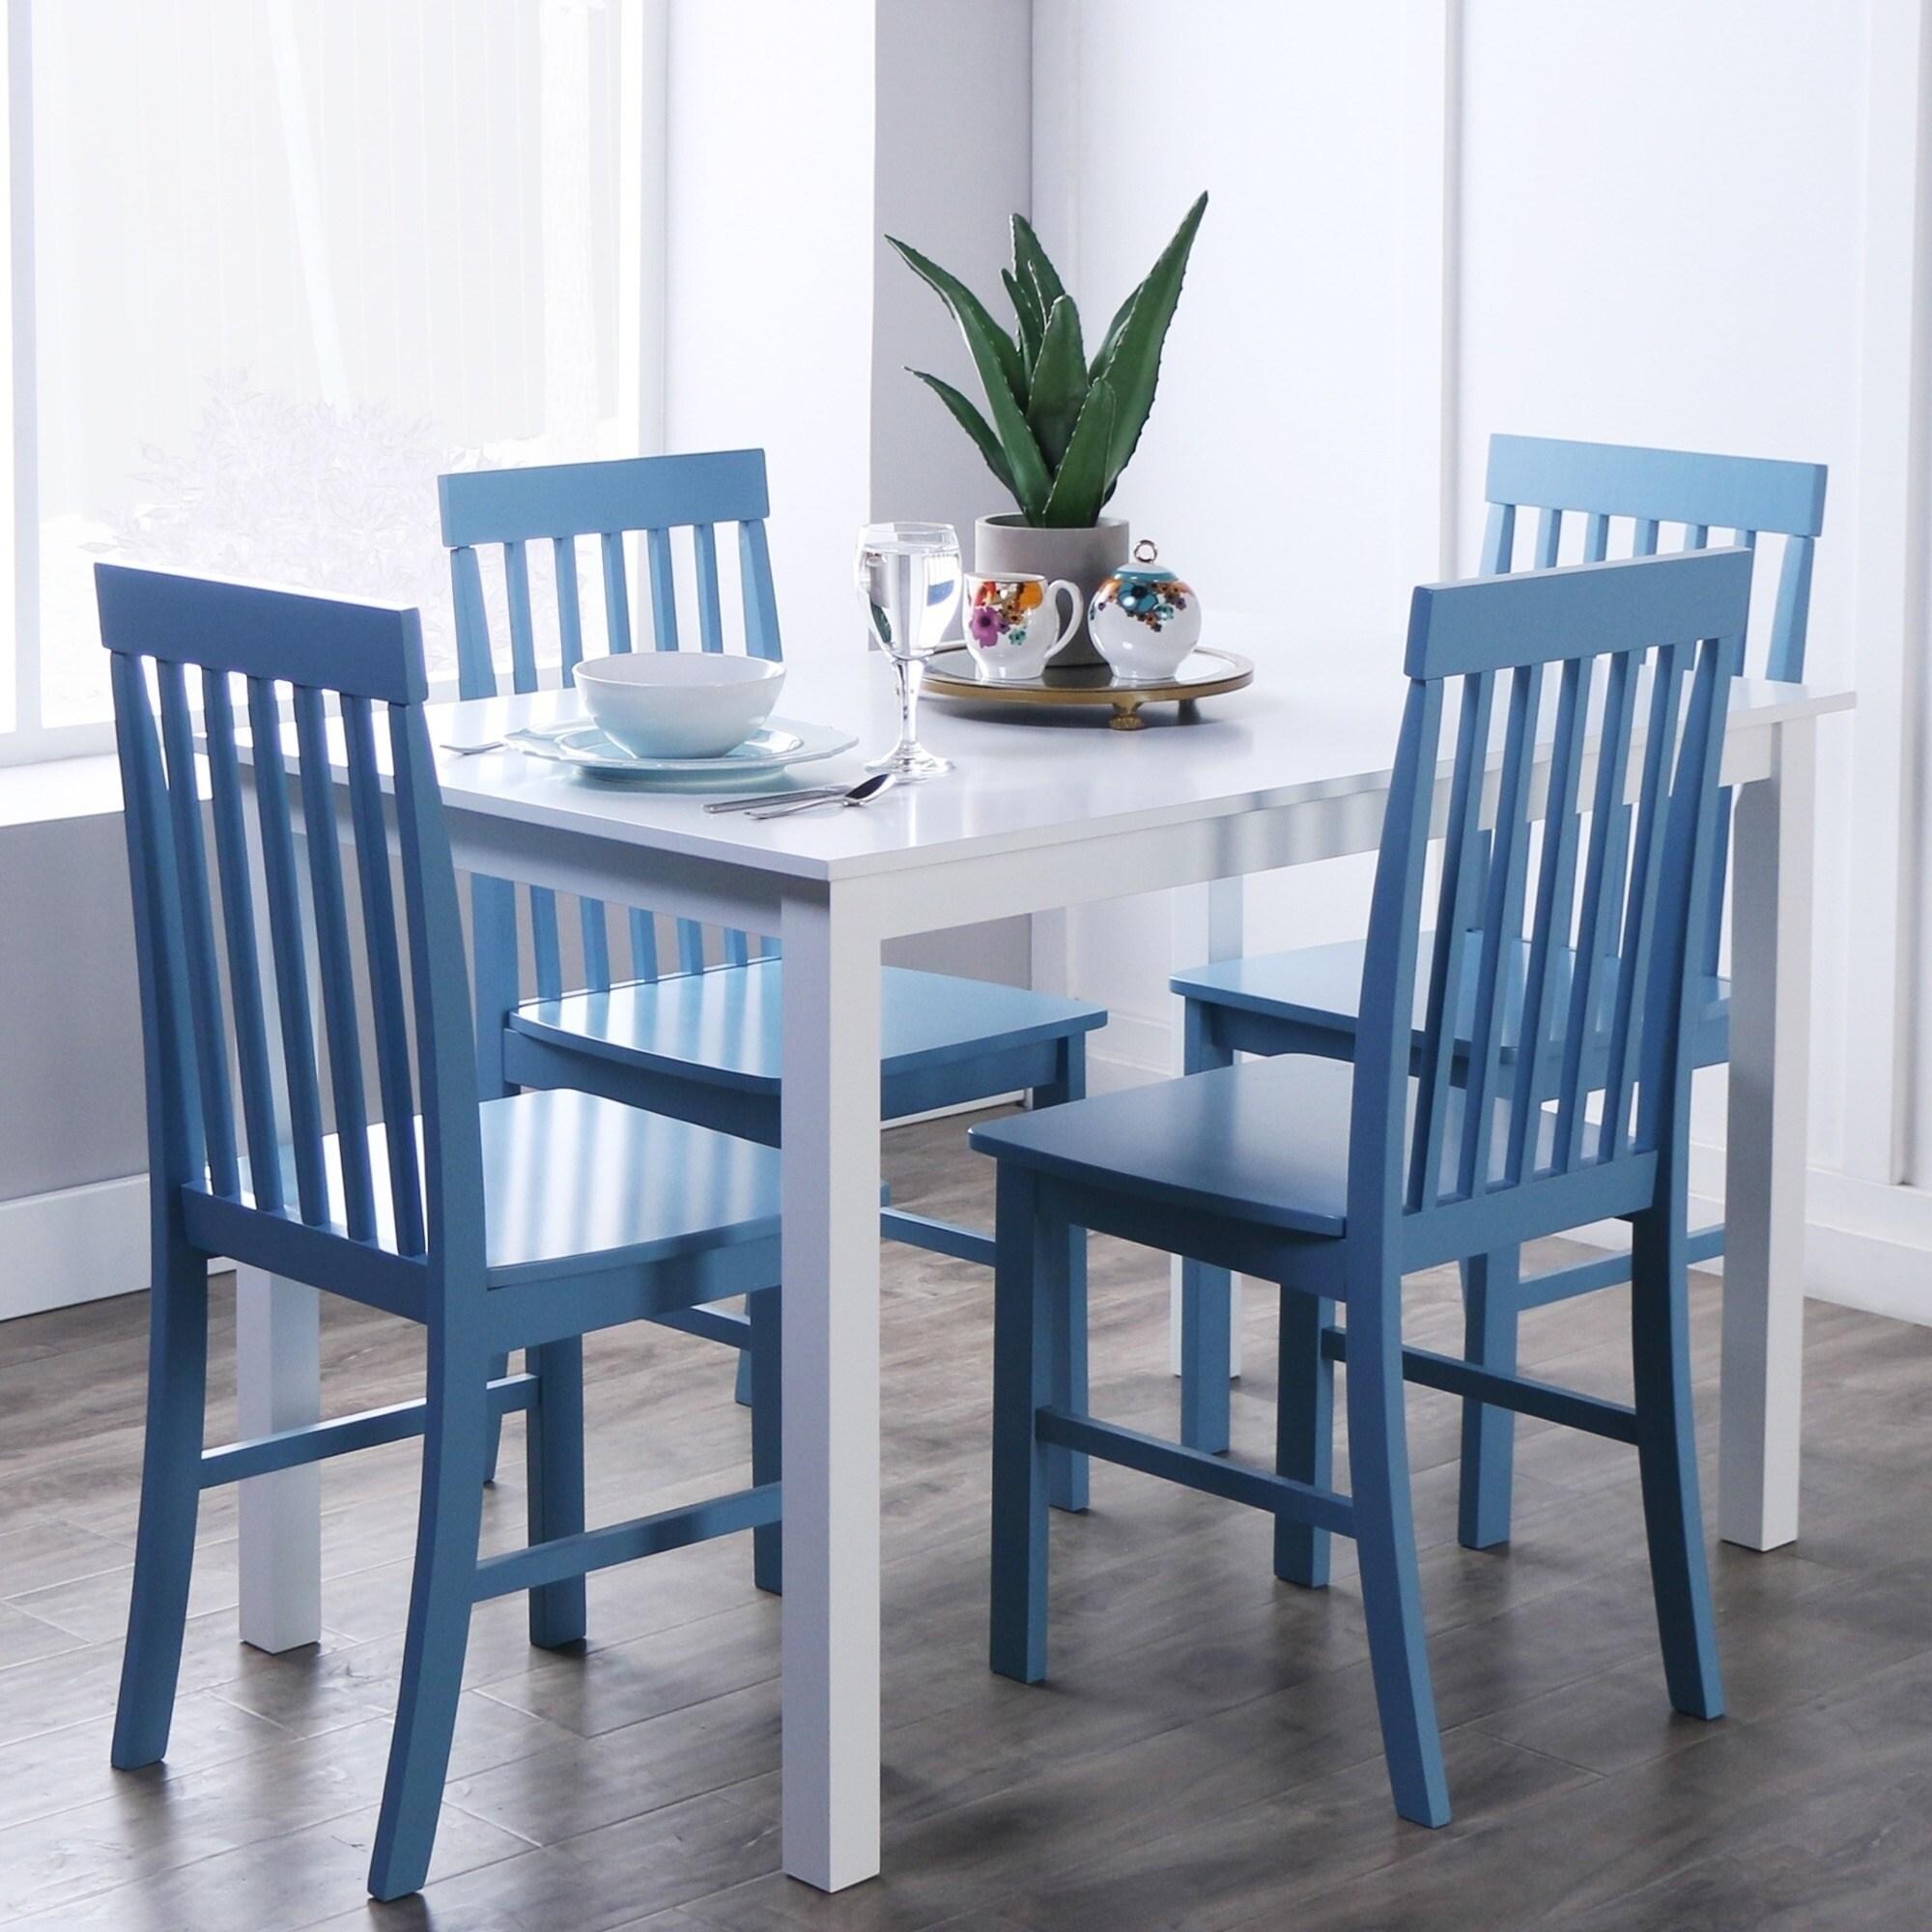 Stupendous Porch Den Pompton 5 Piece White And Powder Blue Dining Set Alphanode Cool Chair Designs And Ideas Alphanodeonline